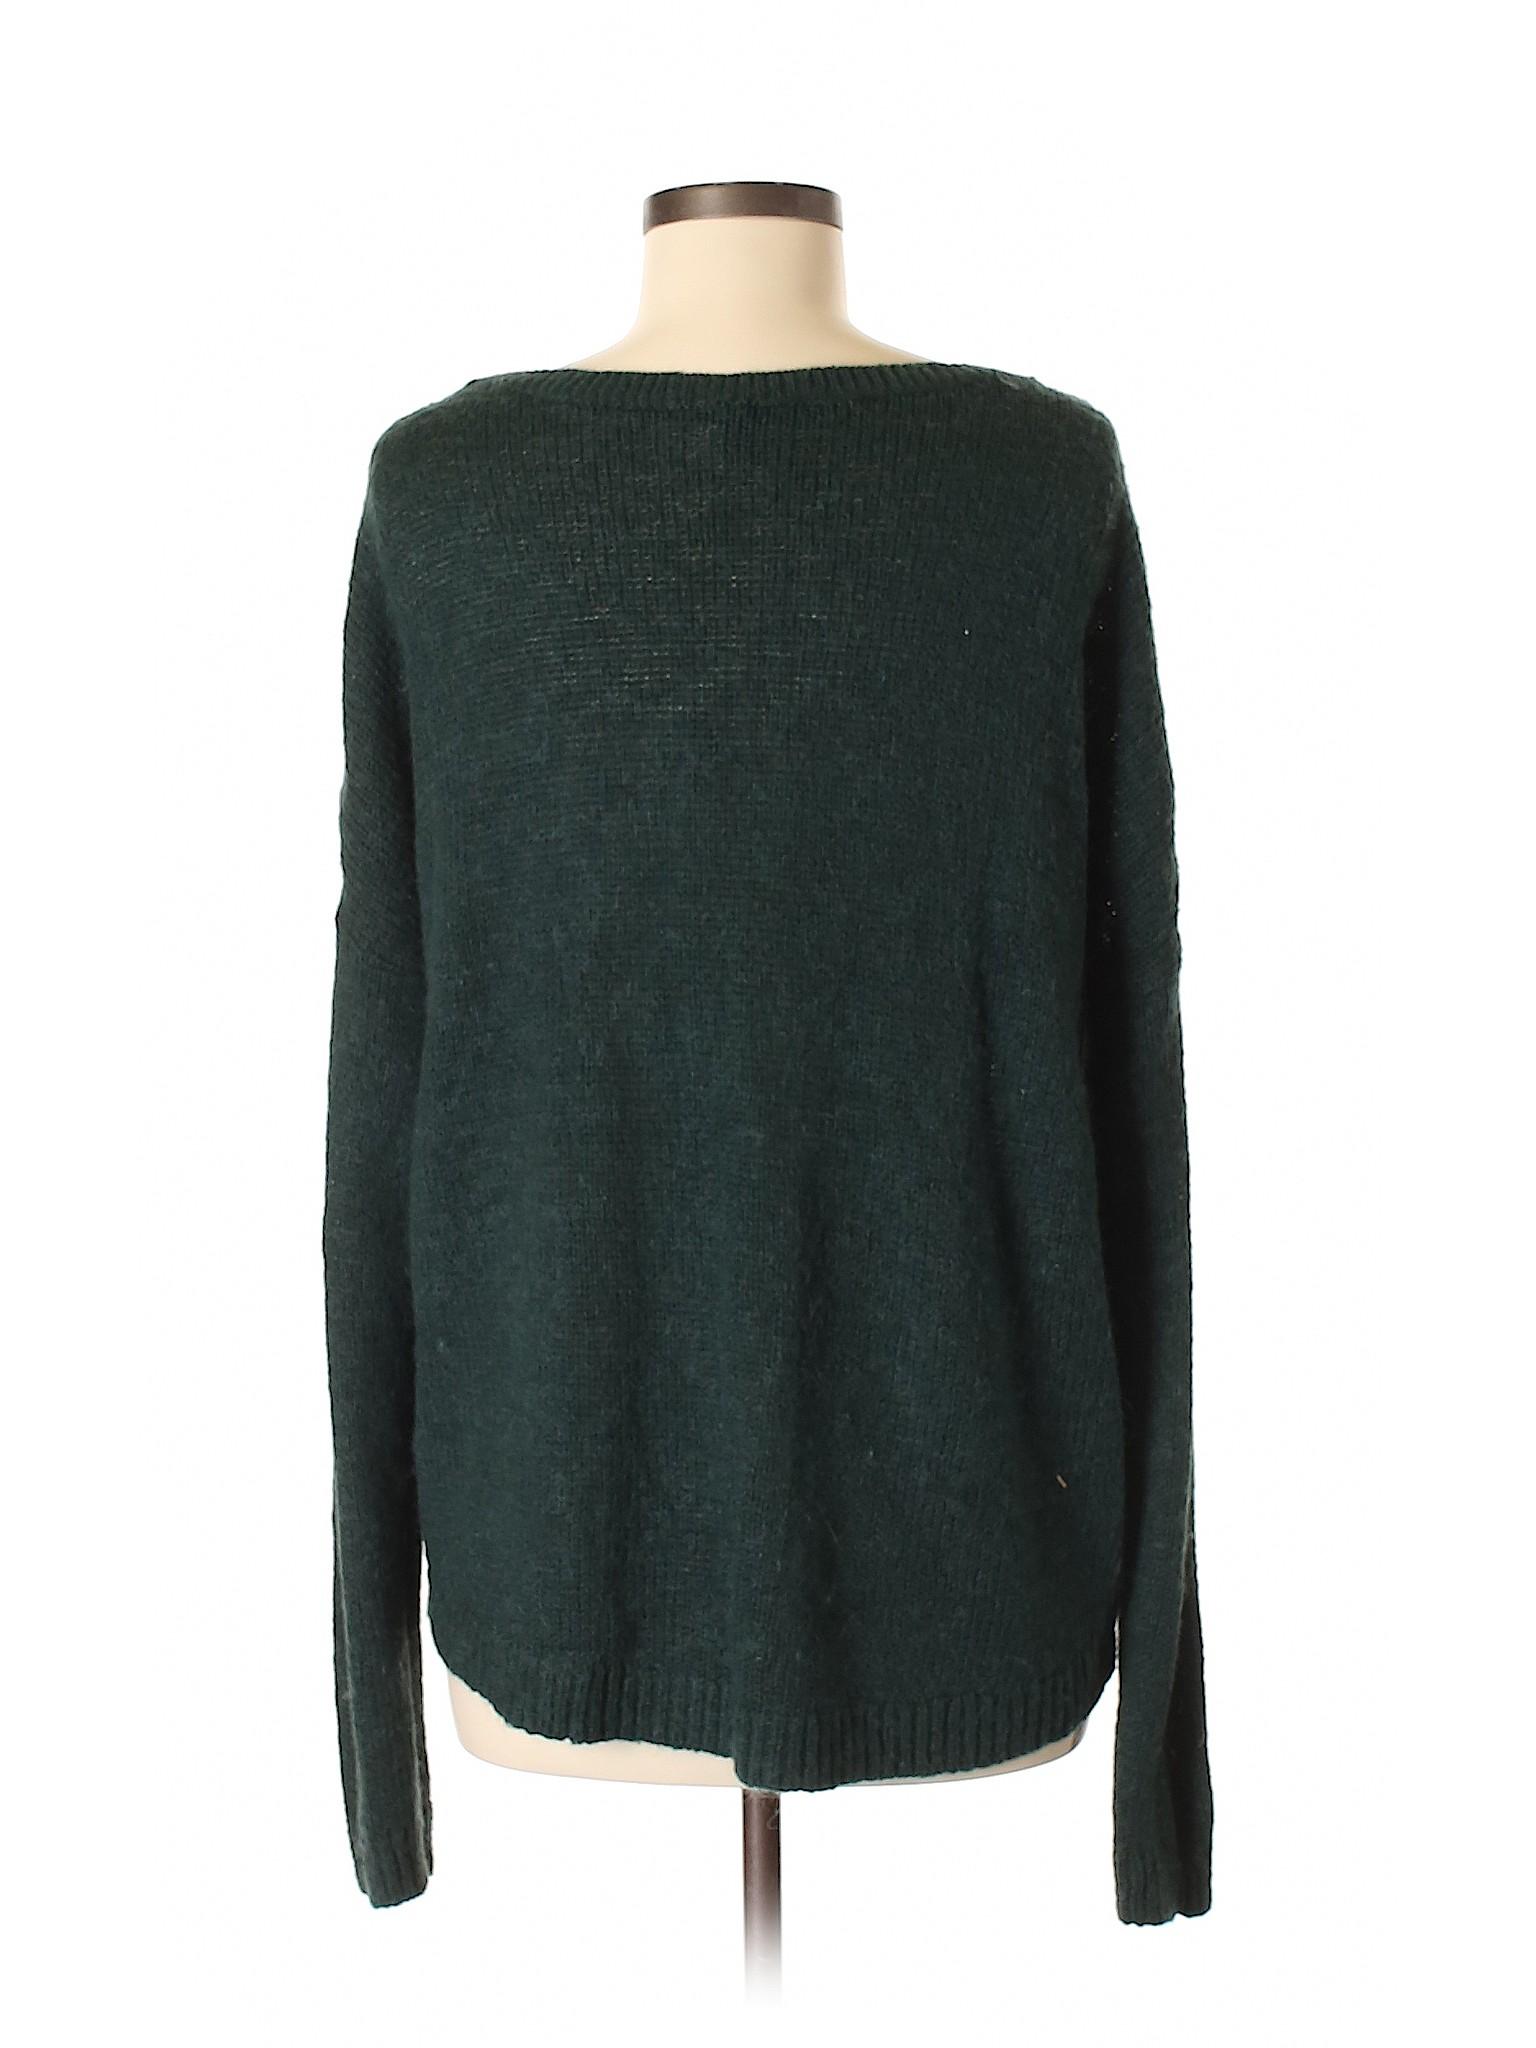 Boutique Boutique Boutique Sweater Pullover Sweater Winter Winter Express Pullover Express Winter rTY6fnTAWw